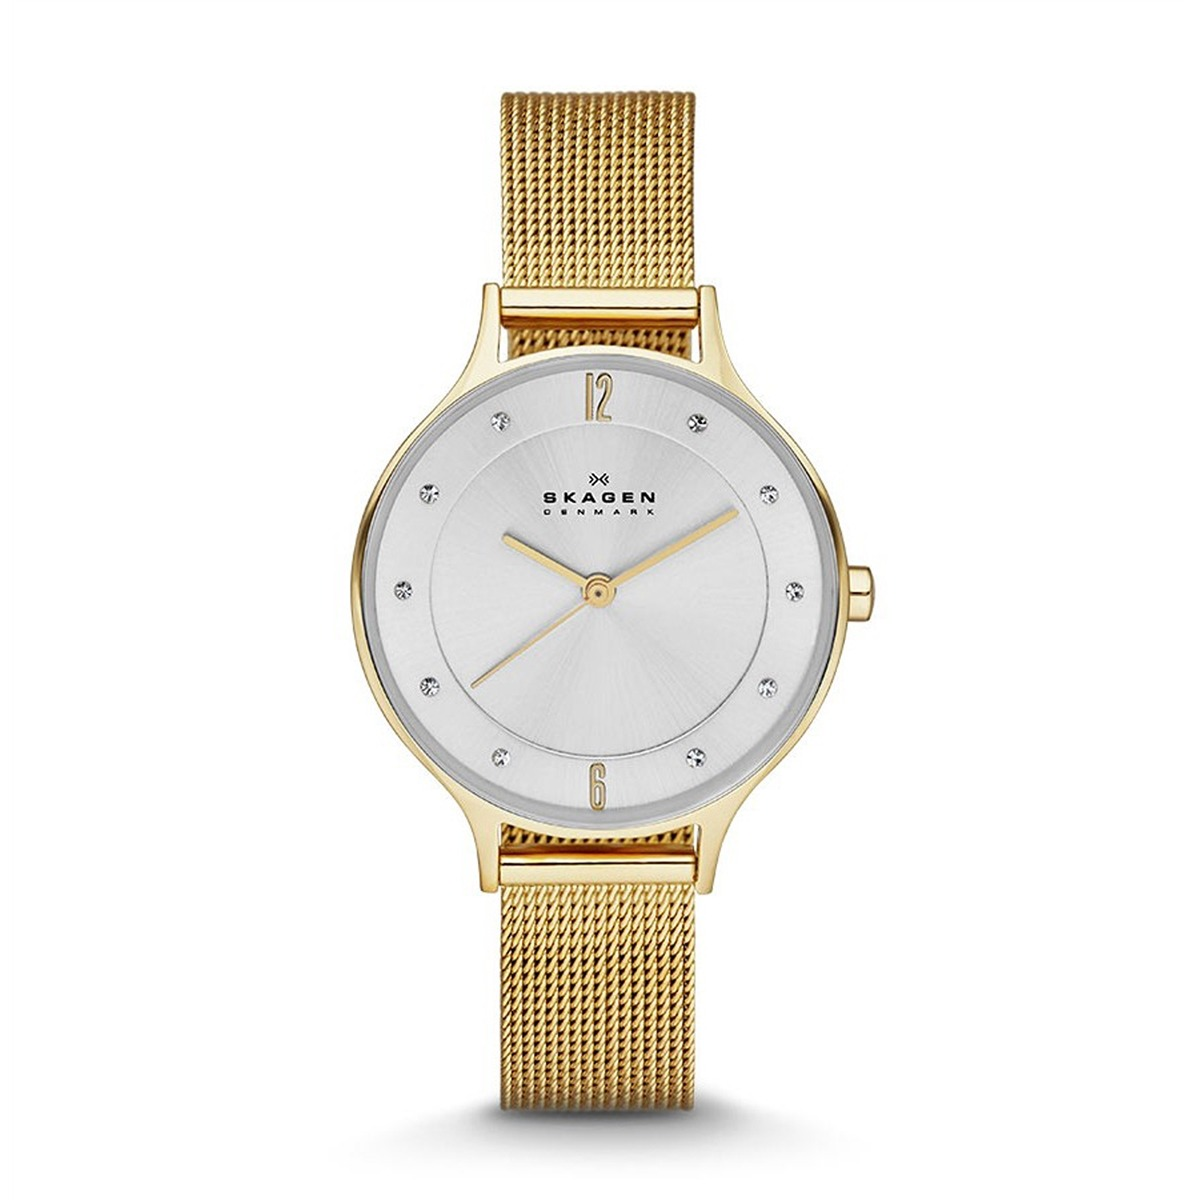 c63fd1a139697 Relógio Skagen Feminino Slim Analógico Skw2150 4kn - R  999,00 em ...